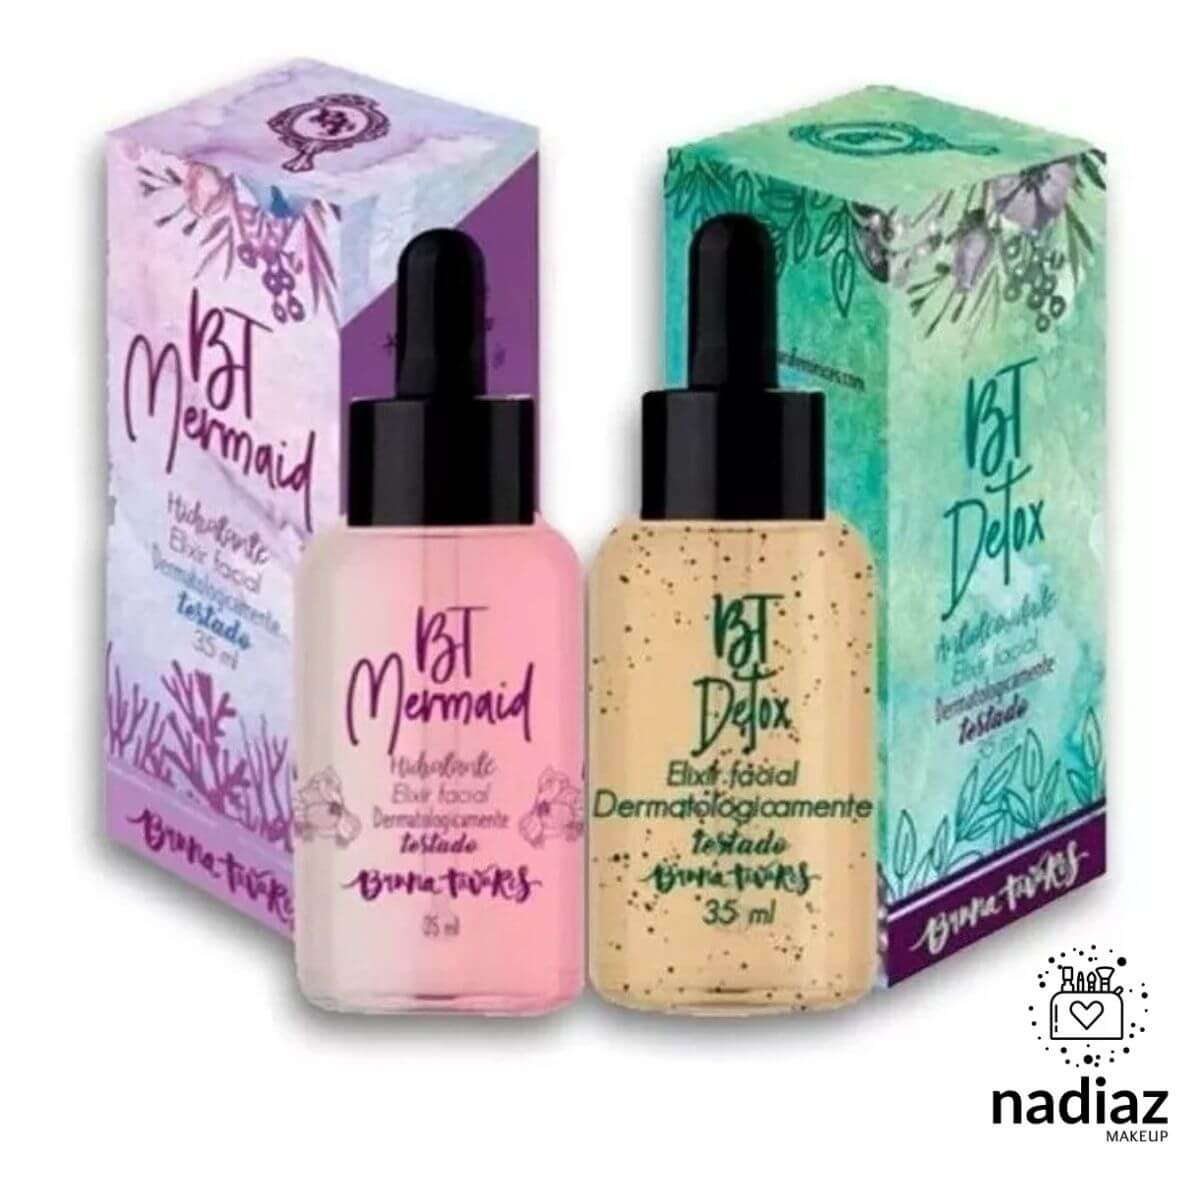 Kit Bt Detox + Bt Mermaid Elixir Facial Bruna Tavares